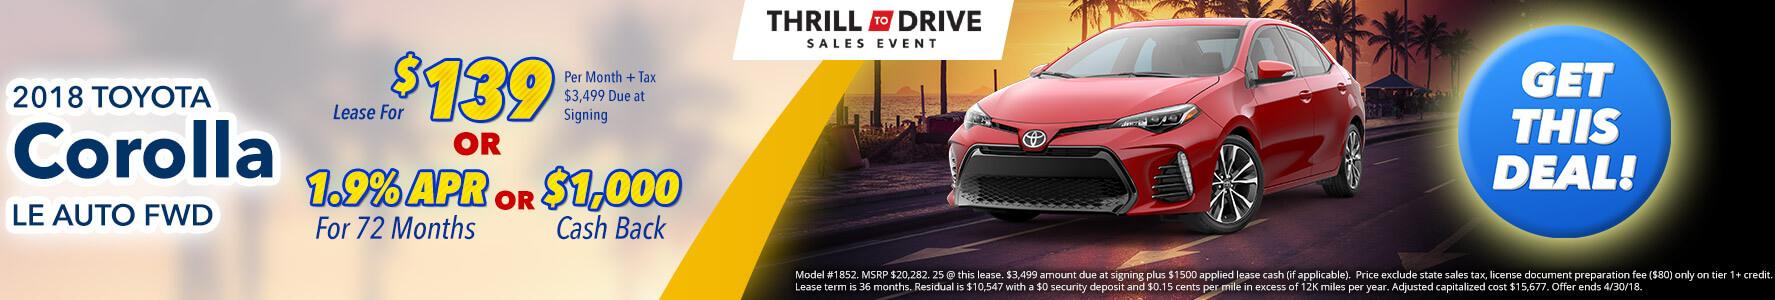 Toyota Corolla $139 Lease